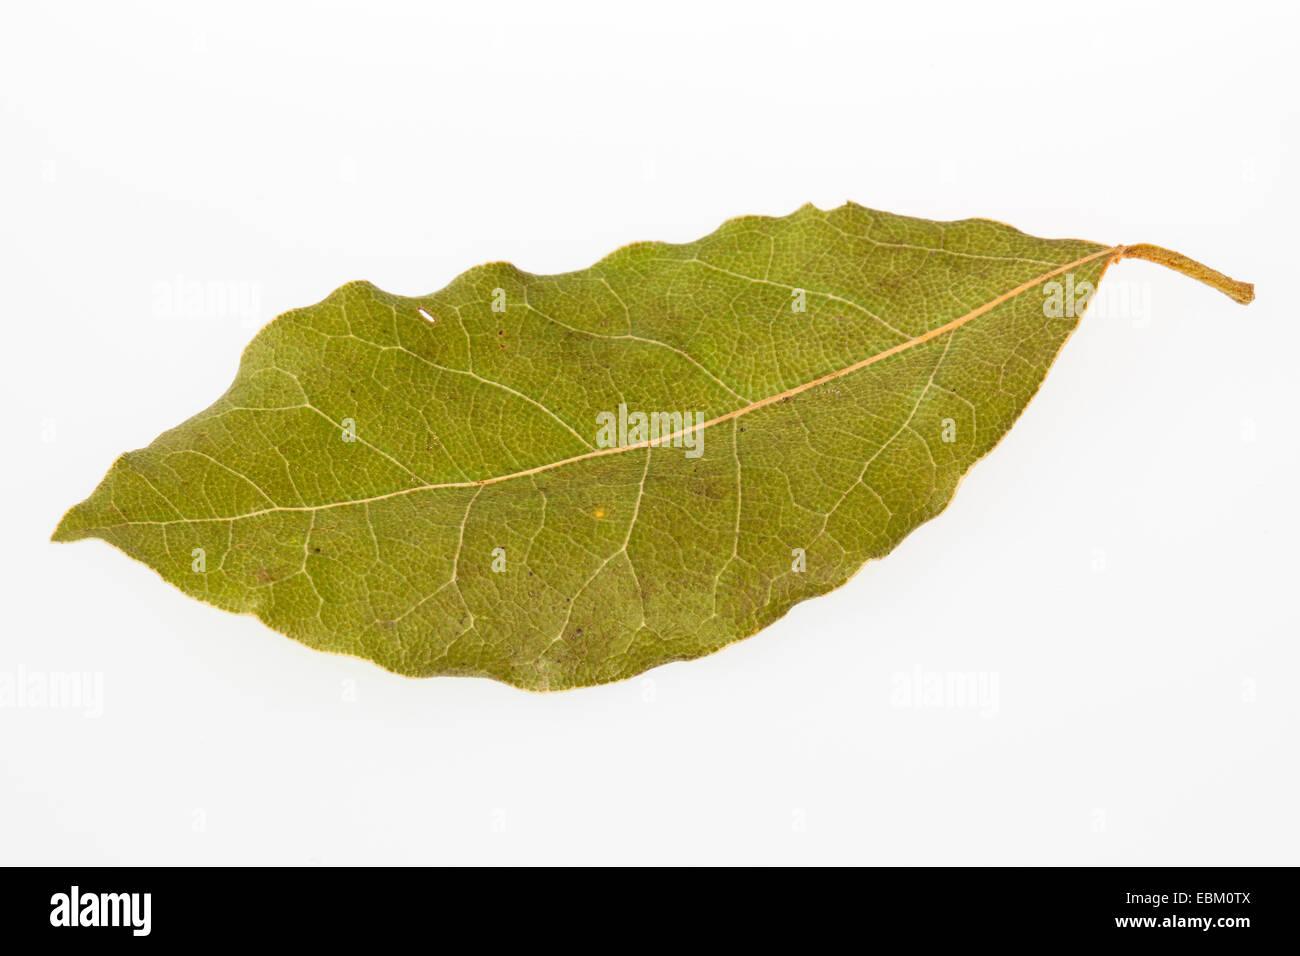 süßer Lorbeer, Lorbeerbaum, Sweet Bay (Laurus Nobilis), getrocknete Blätter von Sweet bay Stockbild